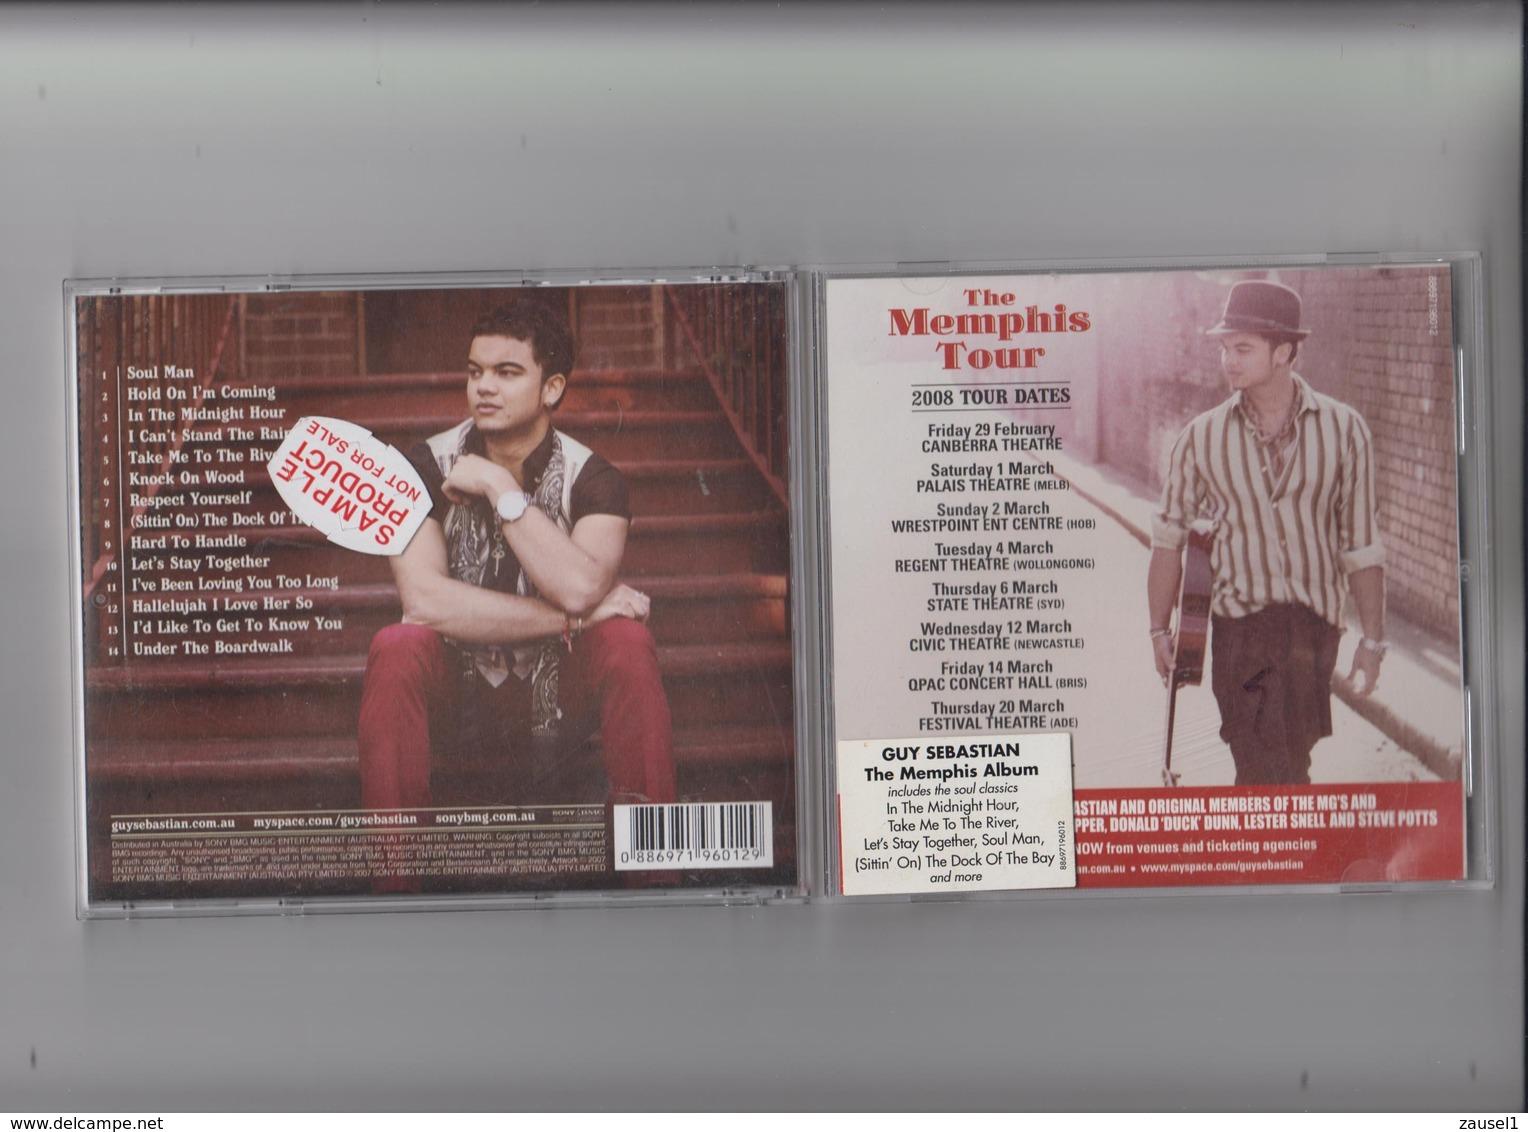 Guy Sebastian - The Memphis Album - Original CD - Country & Folk